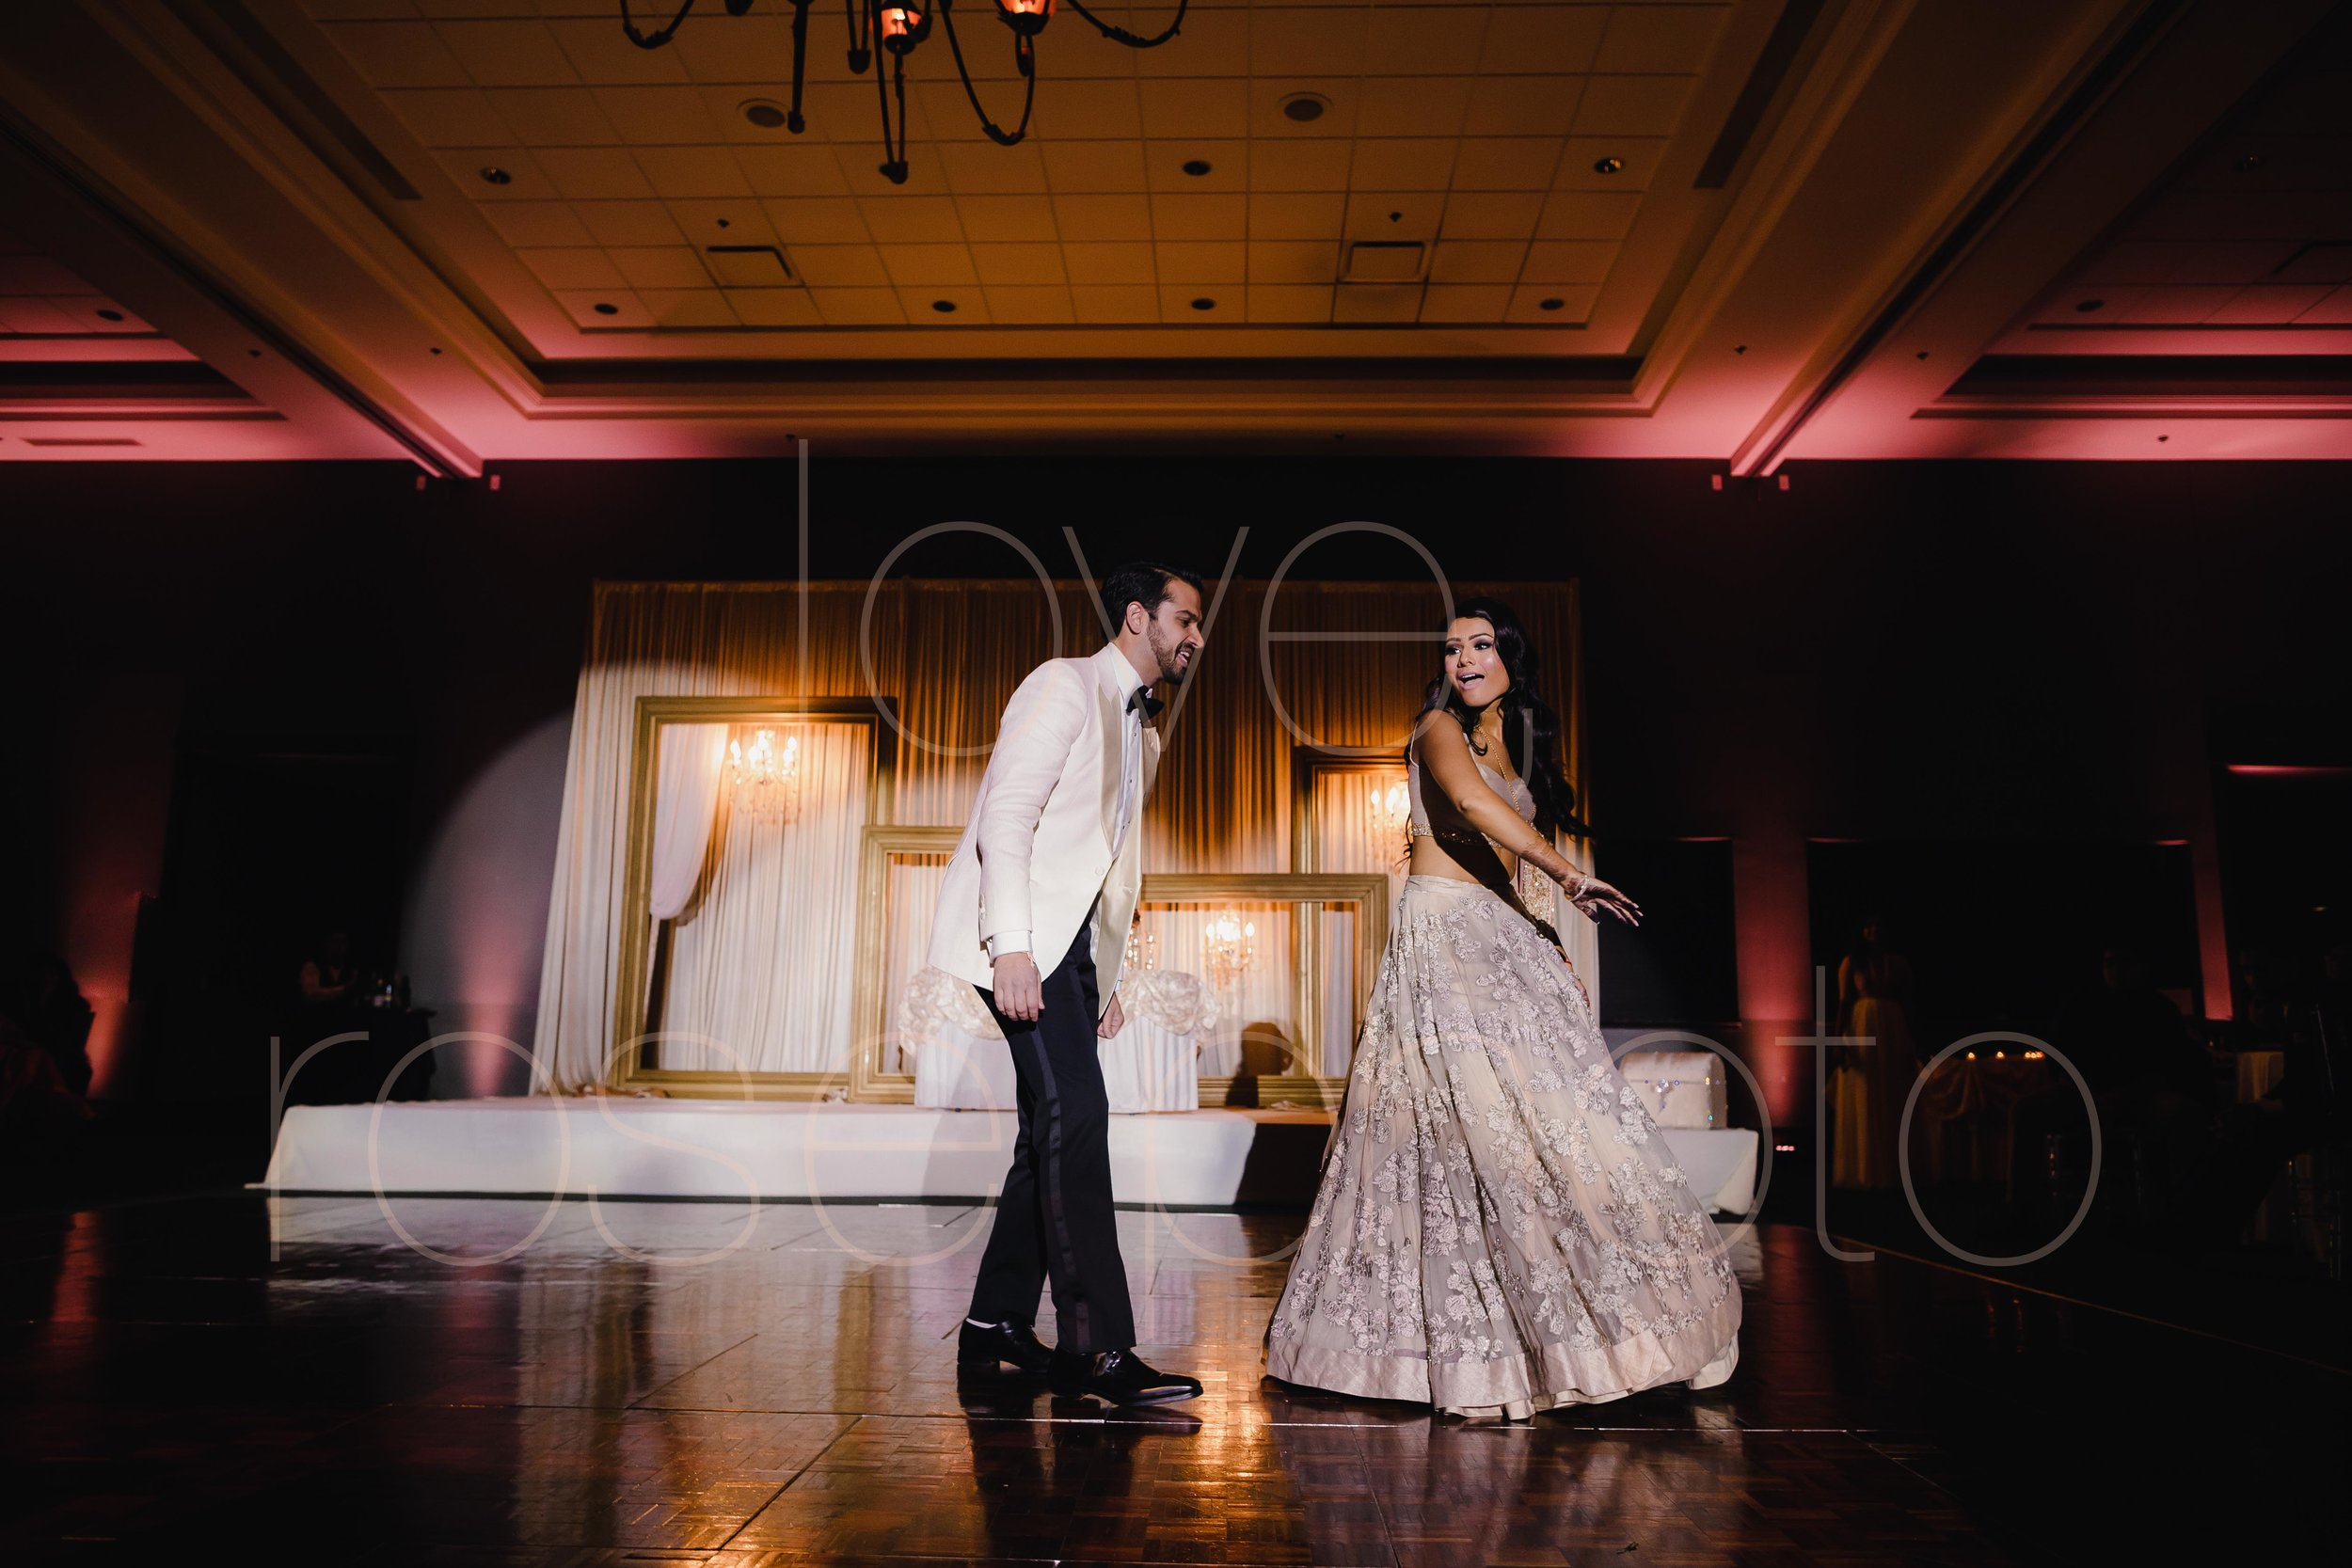 Chicago Indian Wedding best photography lifestyle wedding portrait luxury wedding-56.jpg